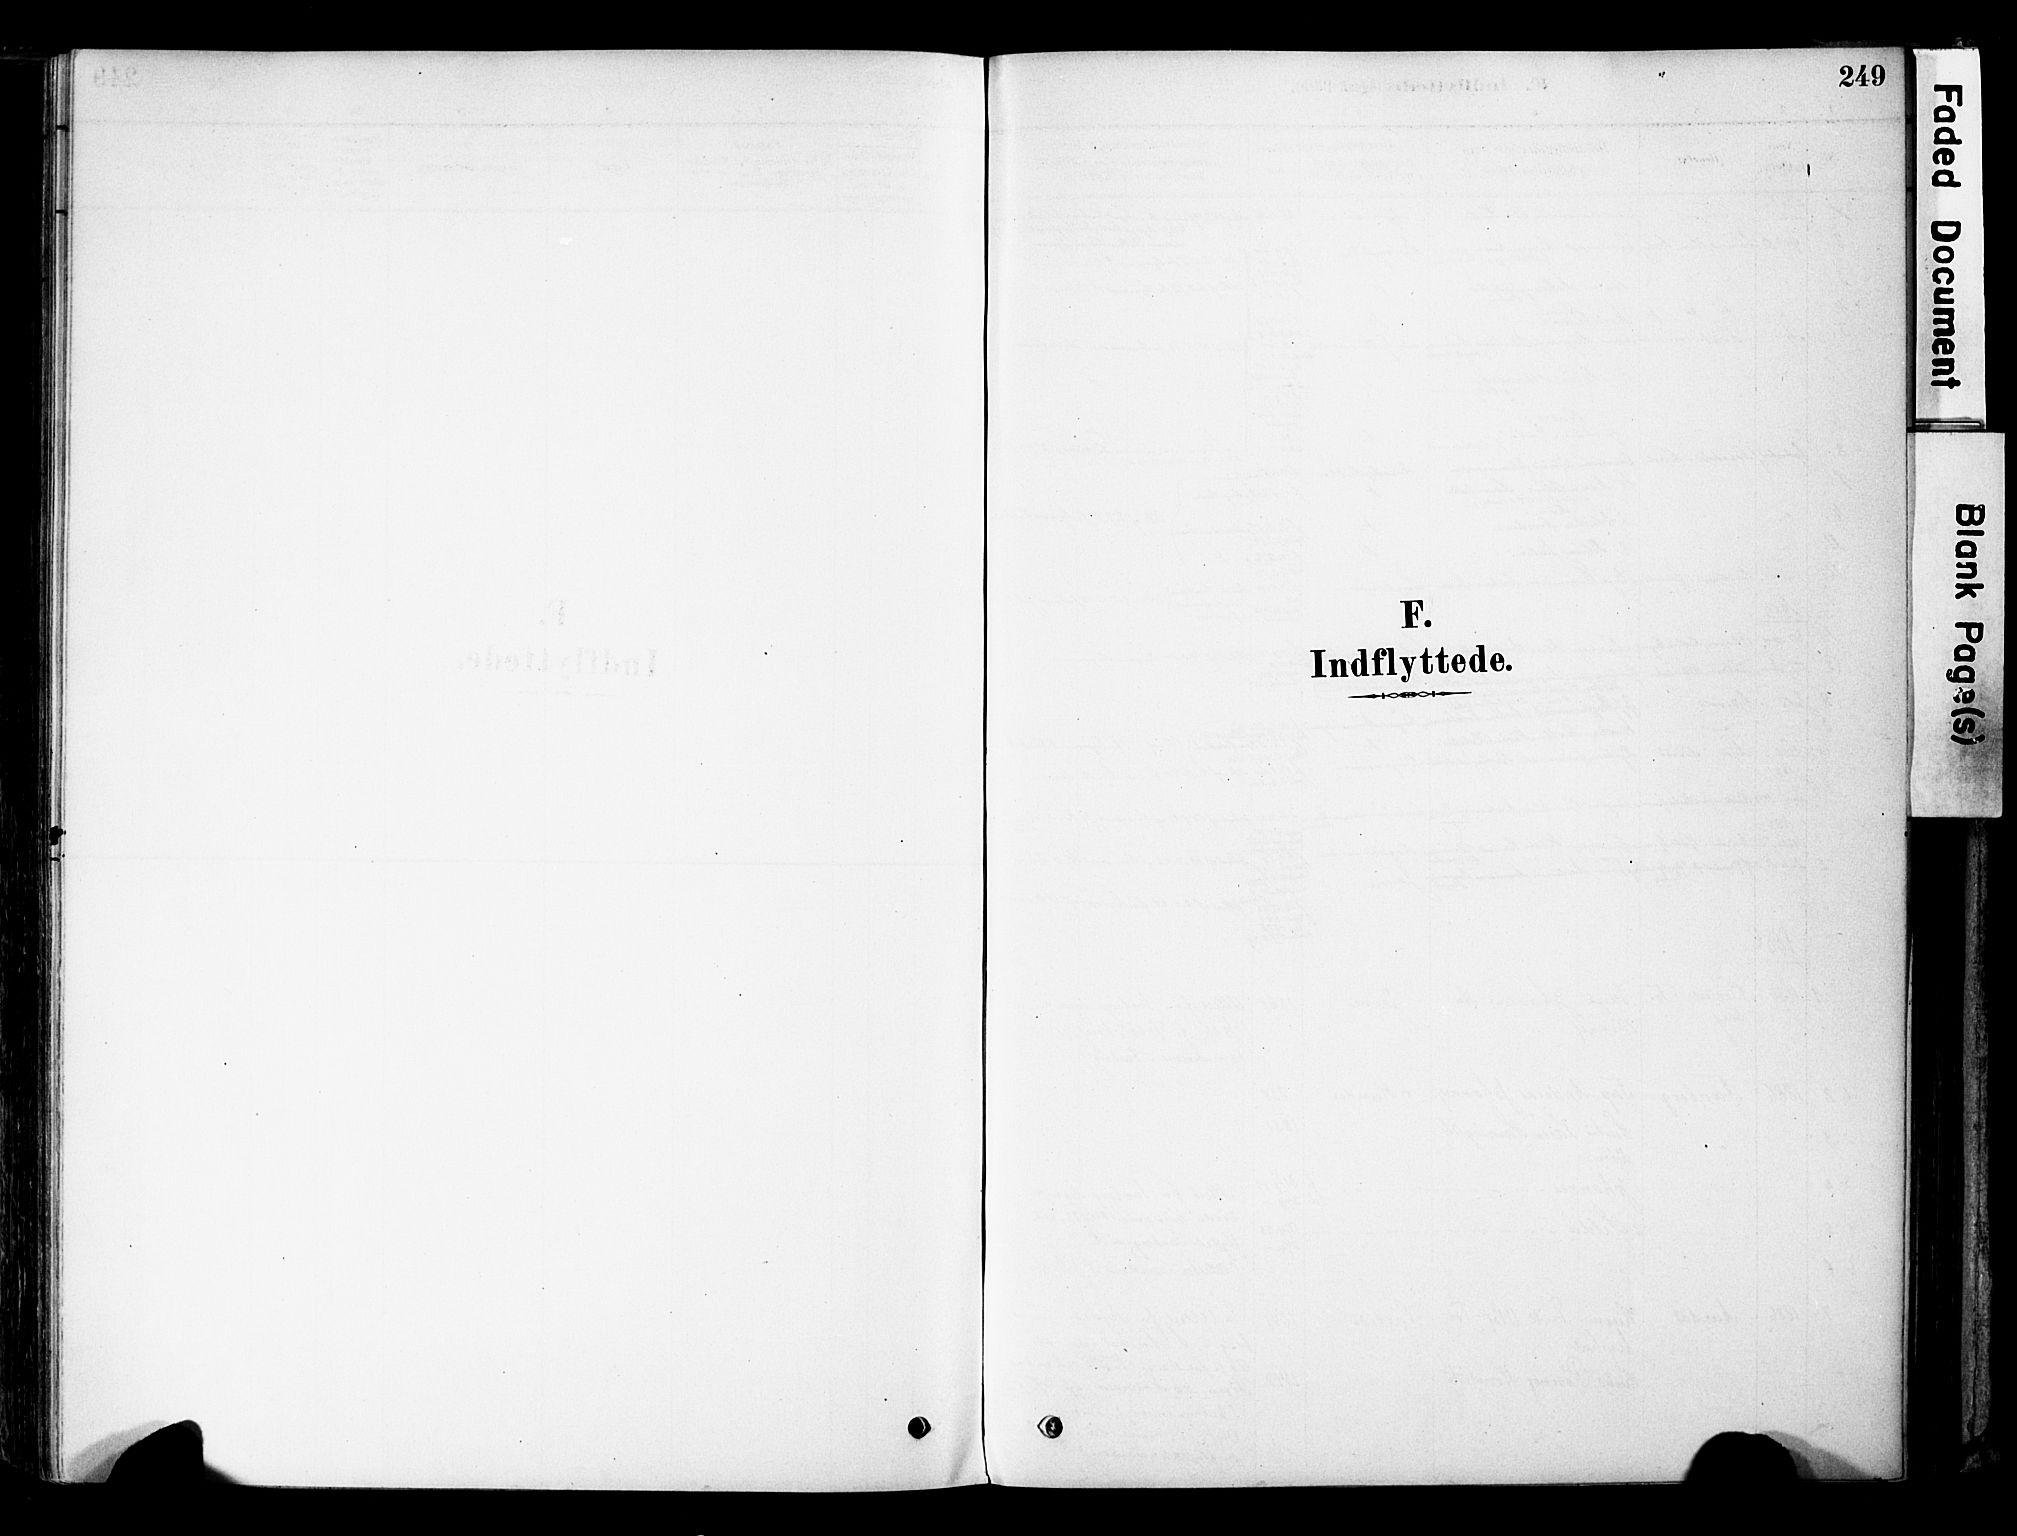 SAH, Øyer prestekontor, Ministerialbok nr. 8, 1878-1897, s. 249